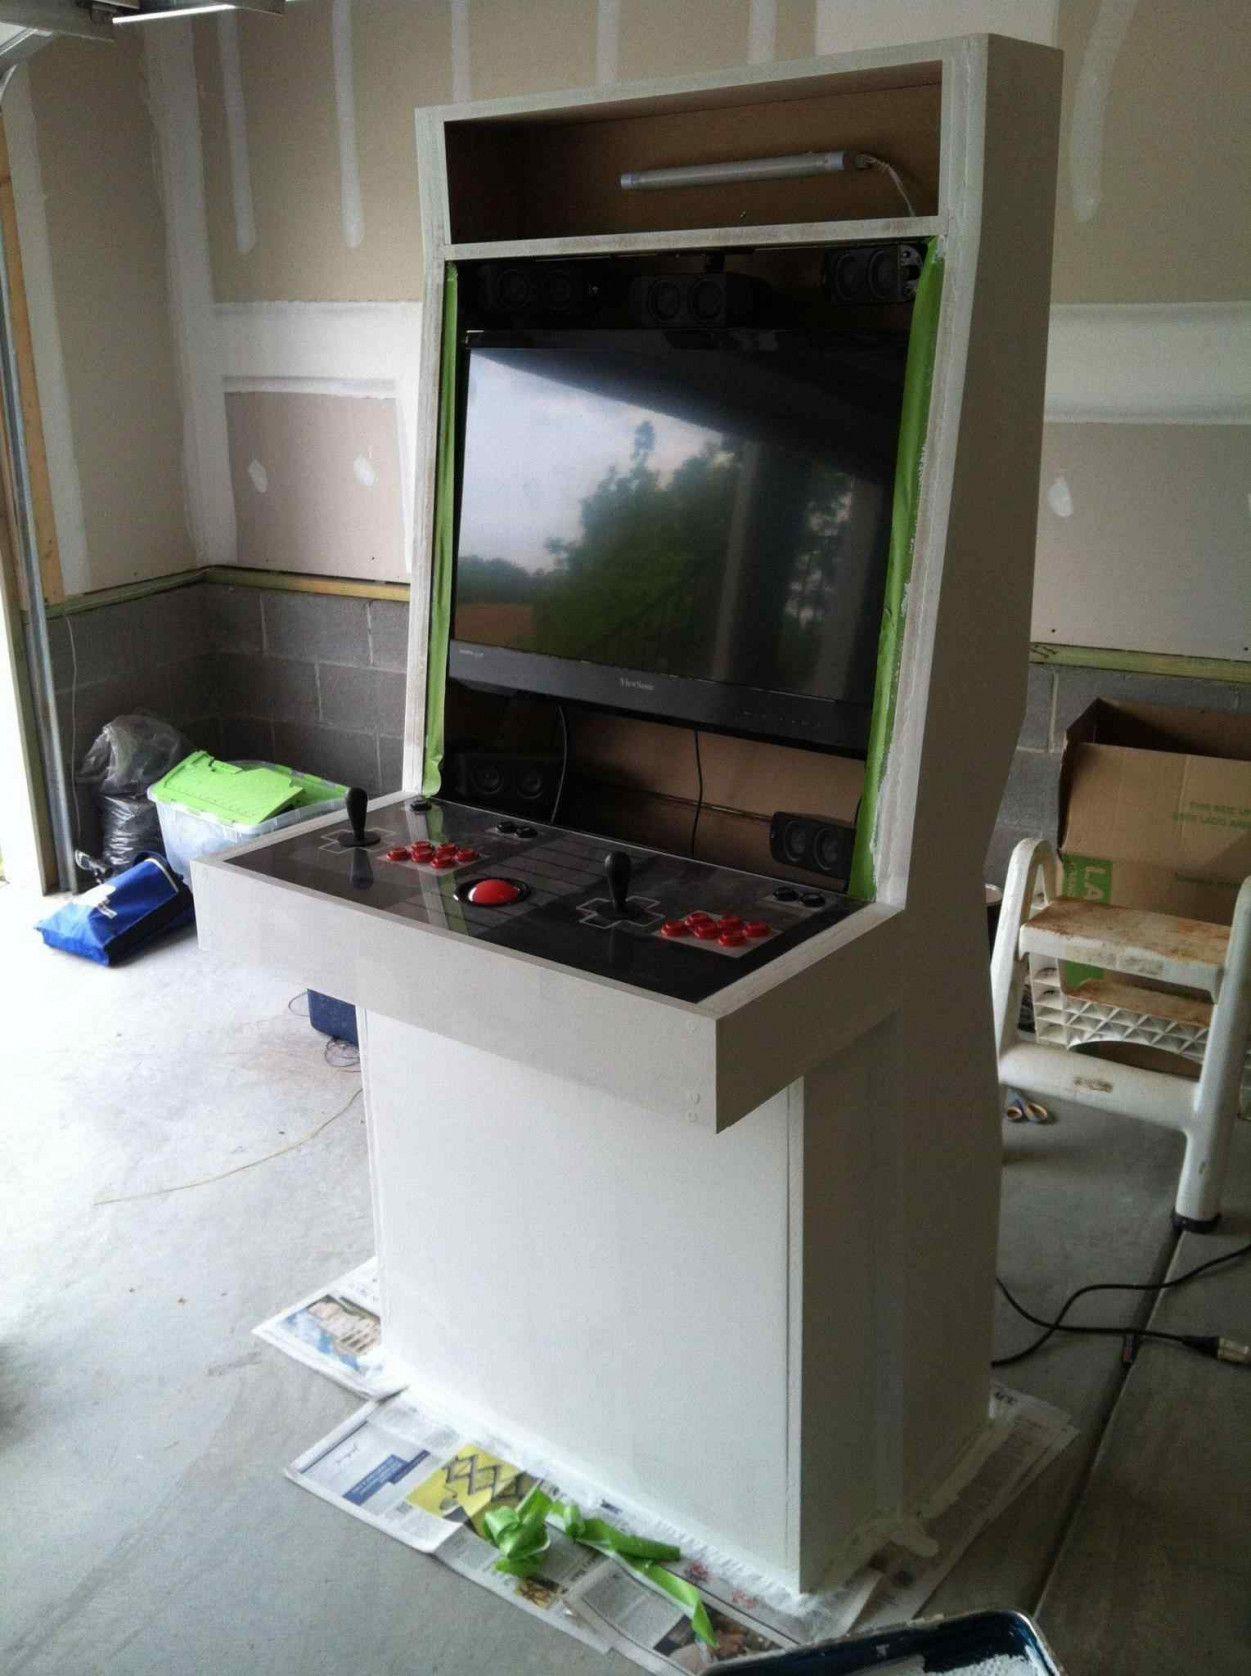 Slim Arcade Cabinet Schematics Wire Center Zodiac R0467600 Printed Circuit Board Power Interface Replacement Kit 77 Plans Apartment Kitchen Ideas Rh Pinterest Com Bartop